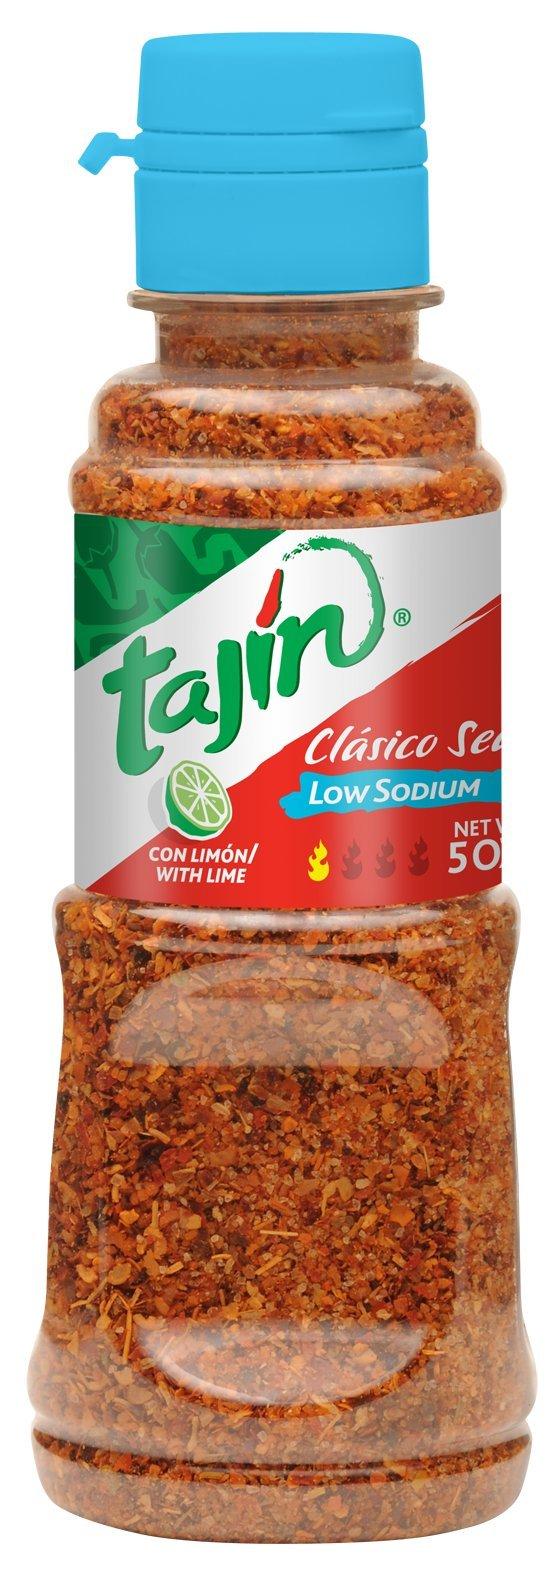 amazon com tajín clásico seasoning 5 oz mexican seasonings